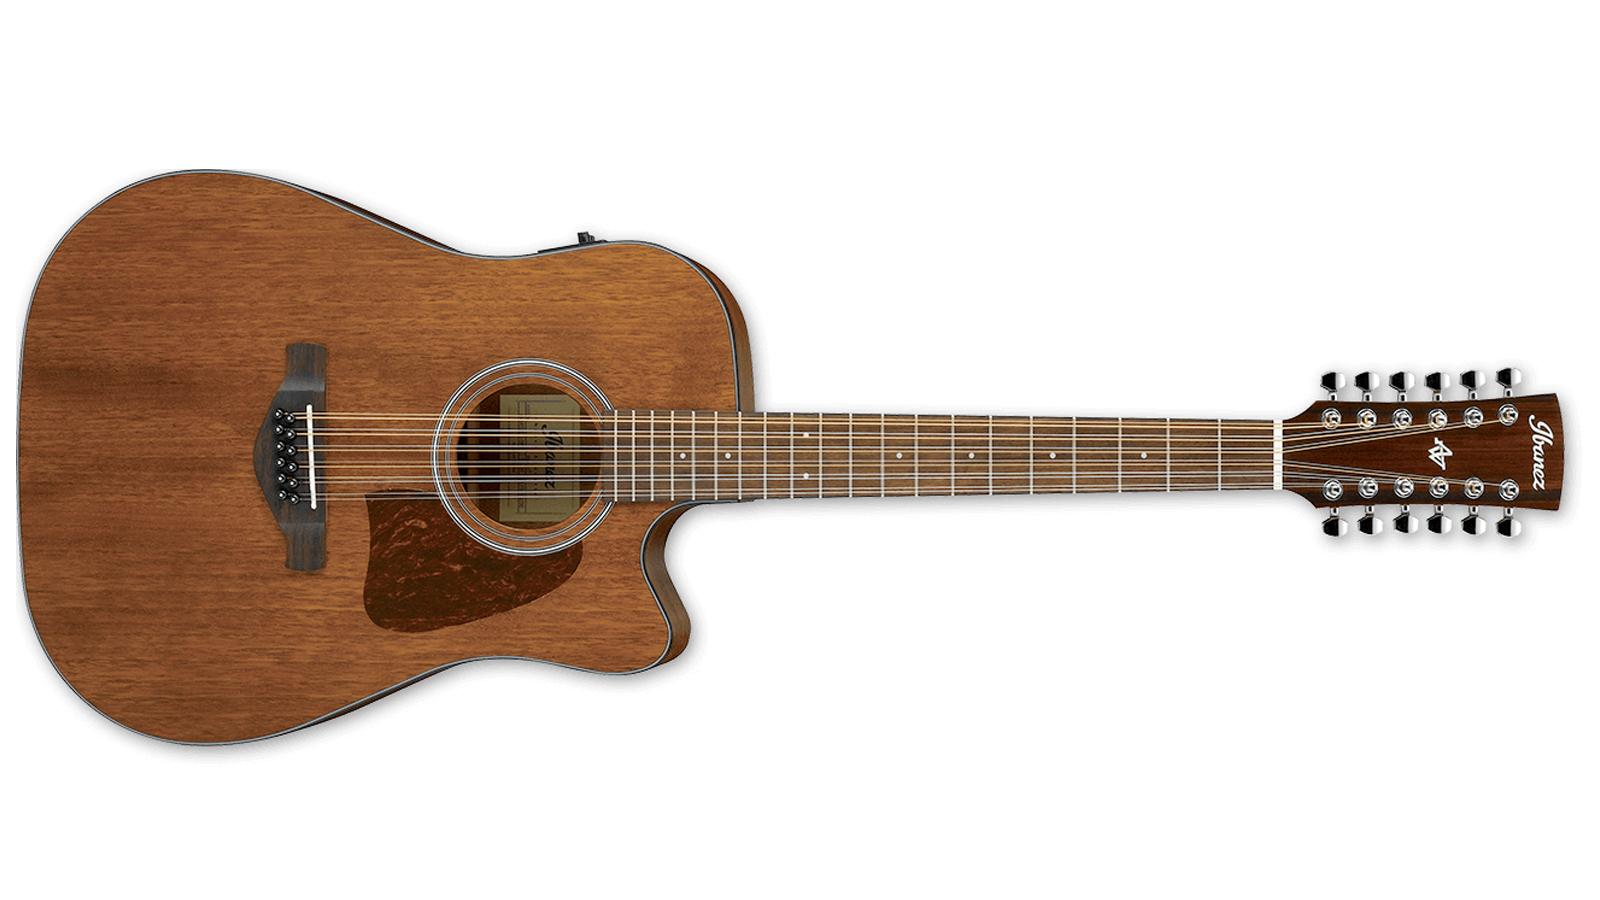 Ibanez AW5412CE-OPN 12-saitige Westerngitarre